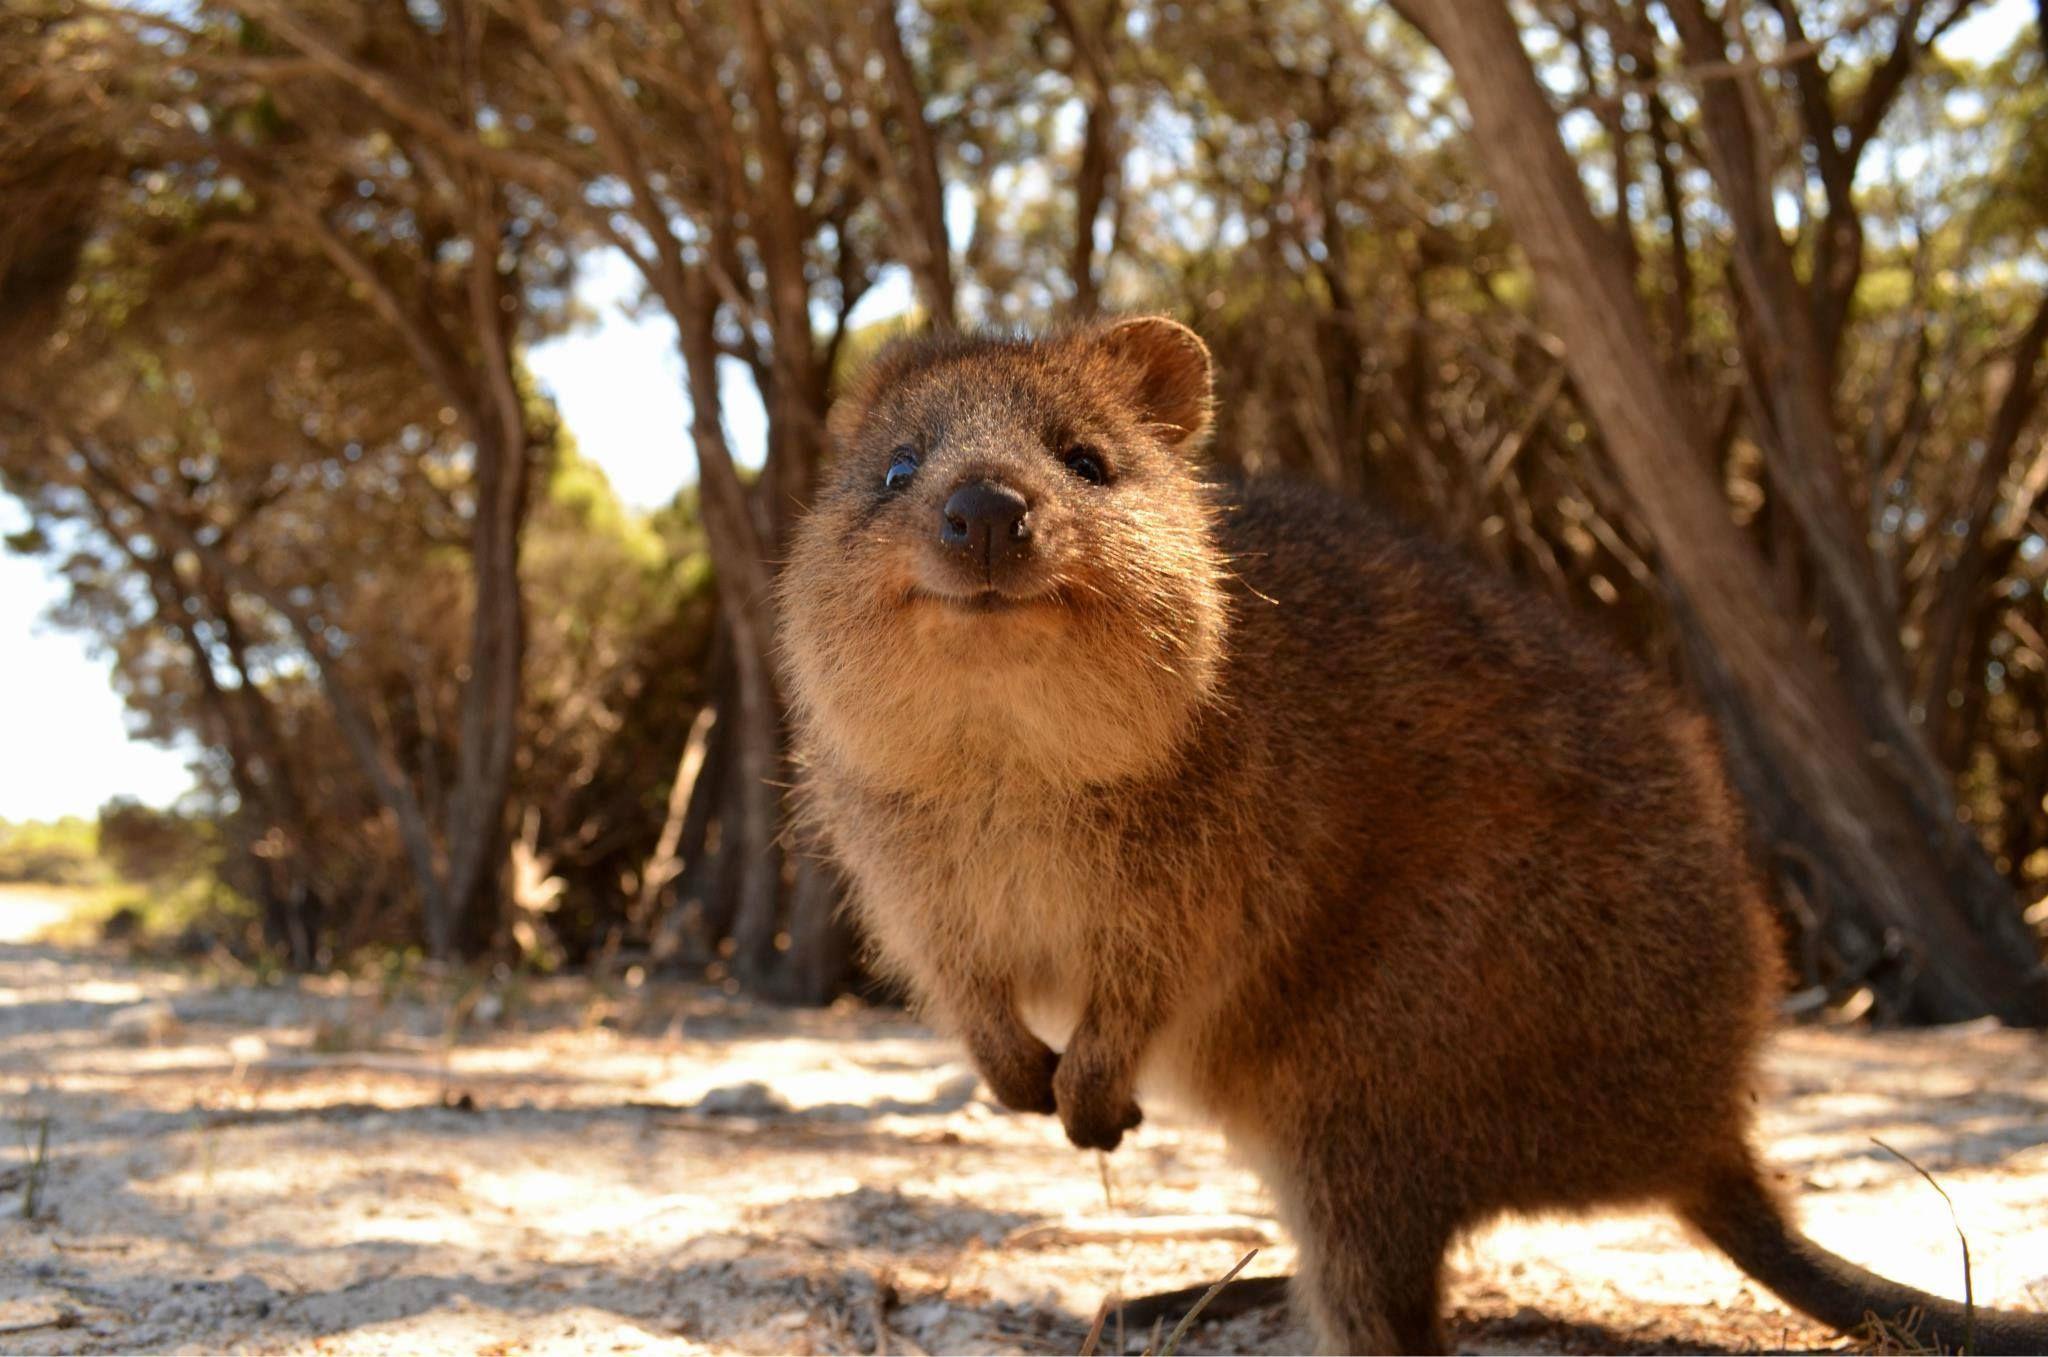 Quokka Quoakka Australia Cute Cute Australian Animals - 15 photos that prove quokkas are the happiest animals in the world